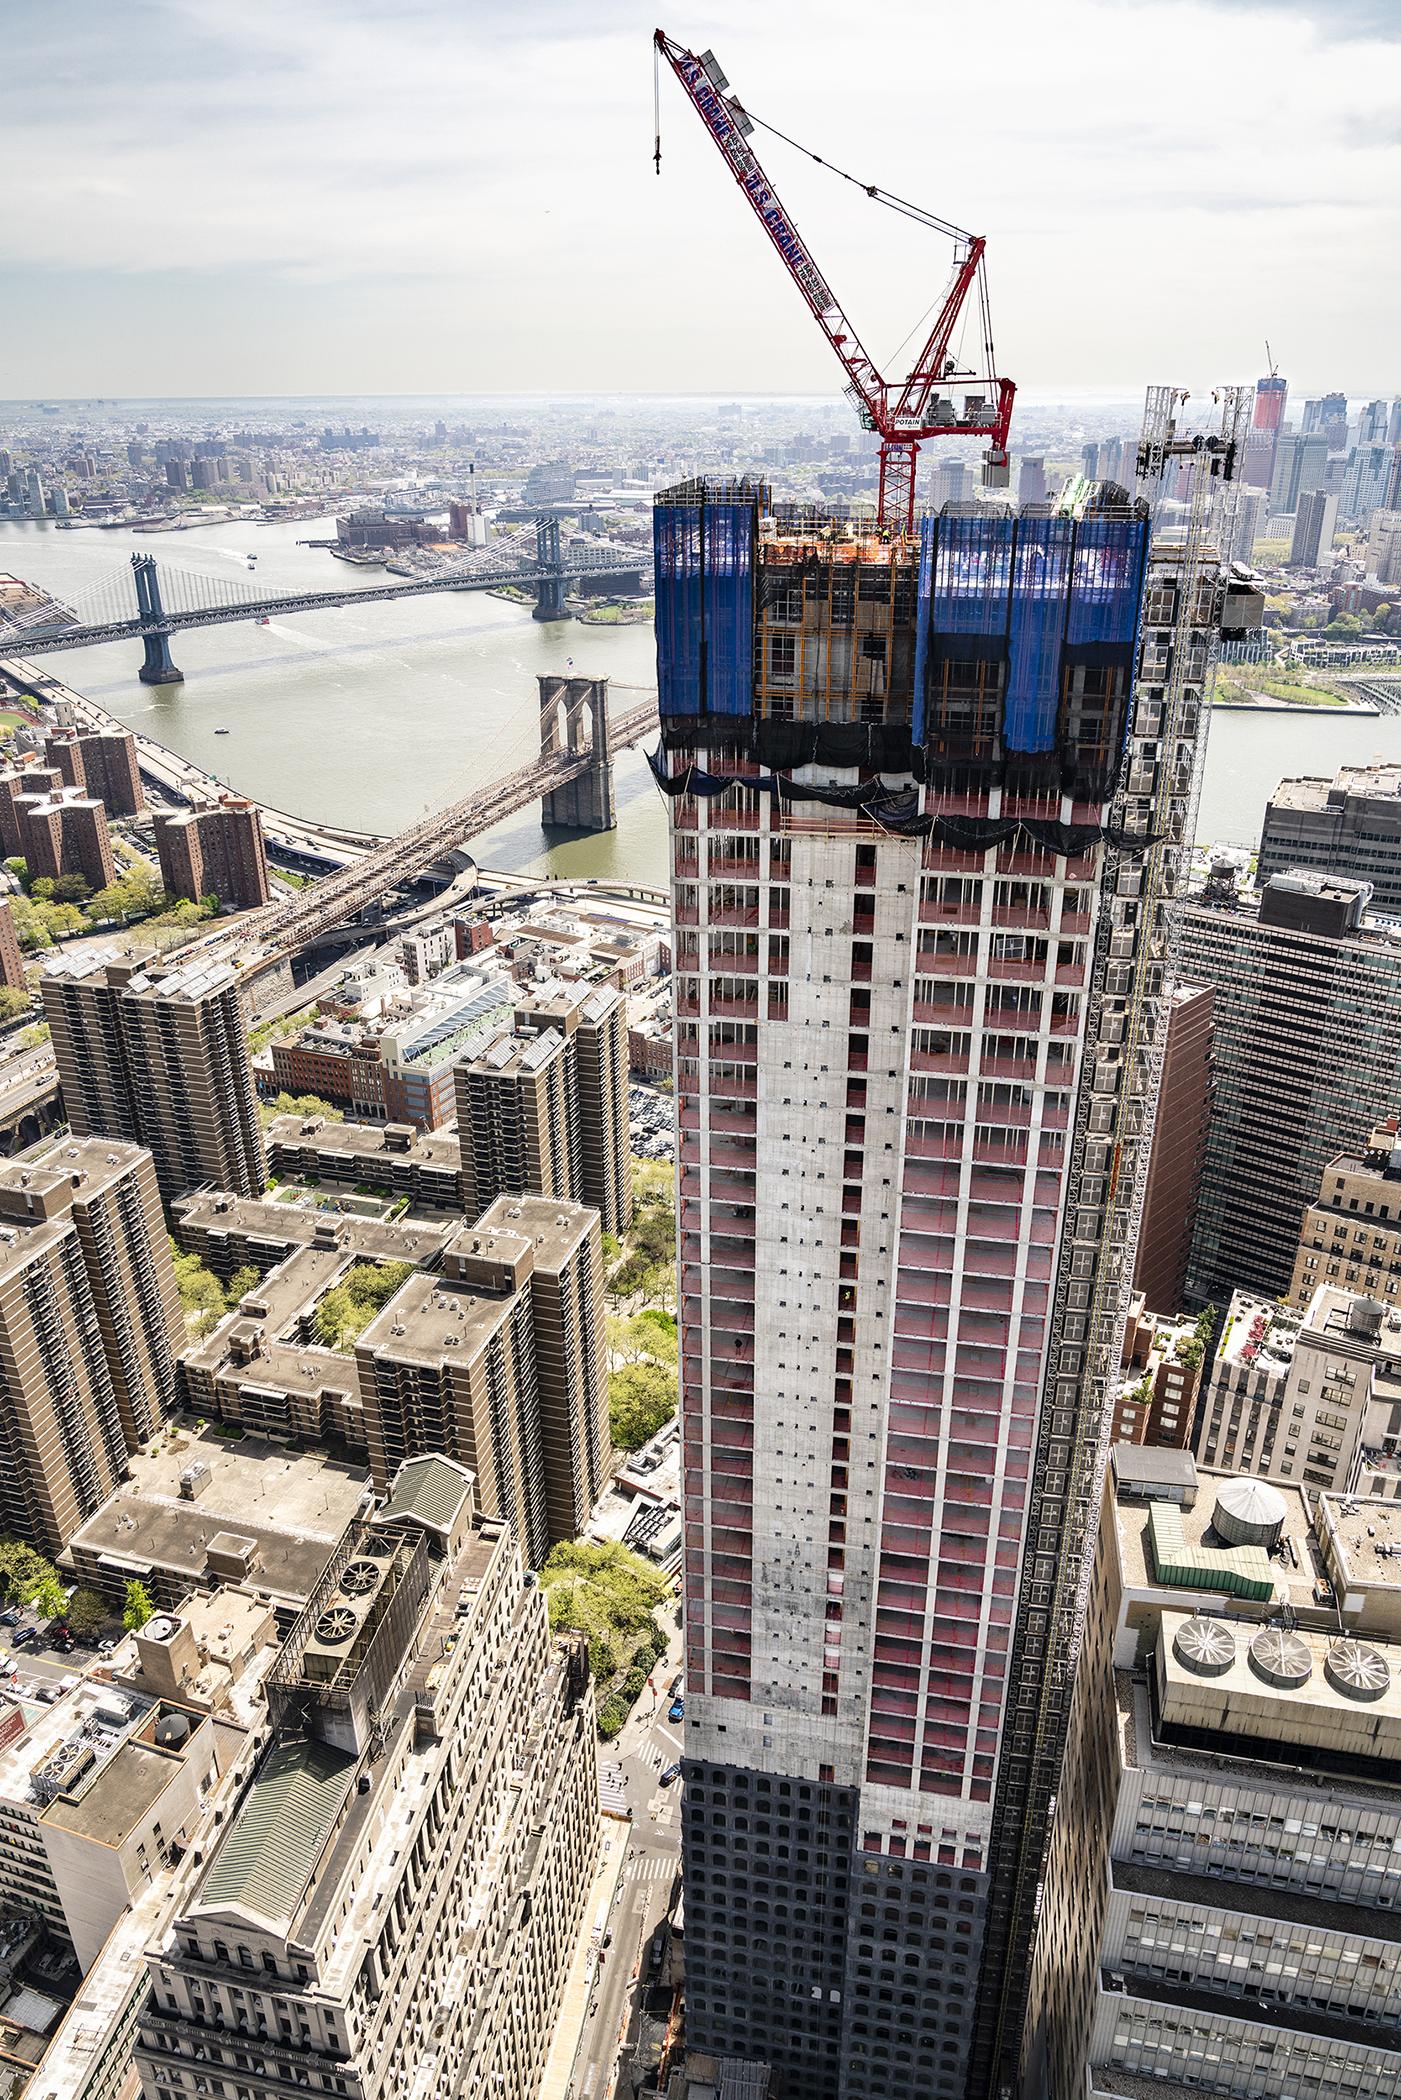 Sir David Adjaye's 130 William Tops Out In Lower Manhattan's Financial District